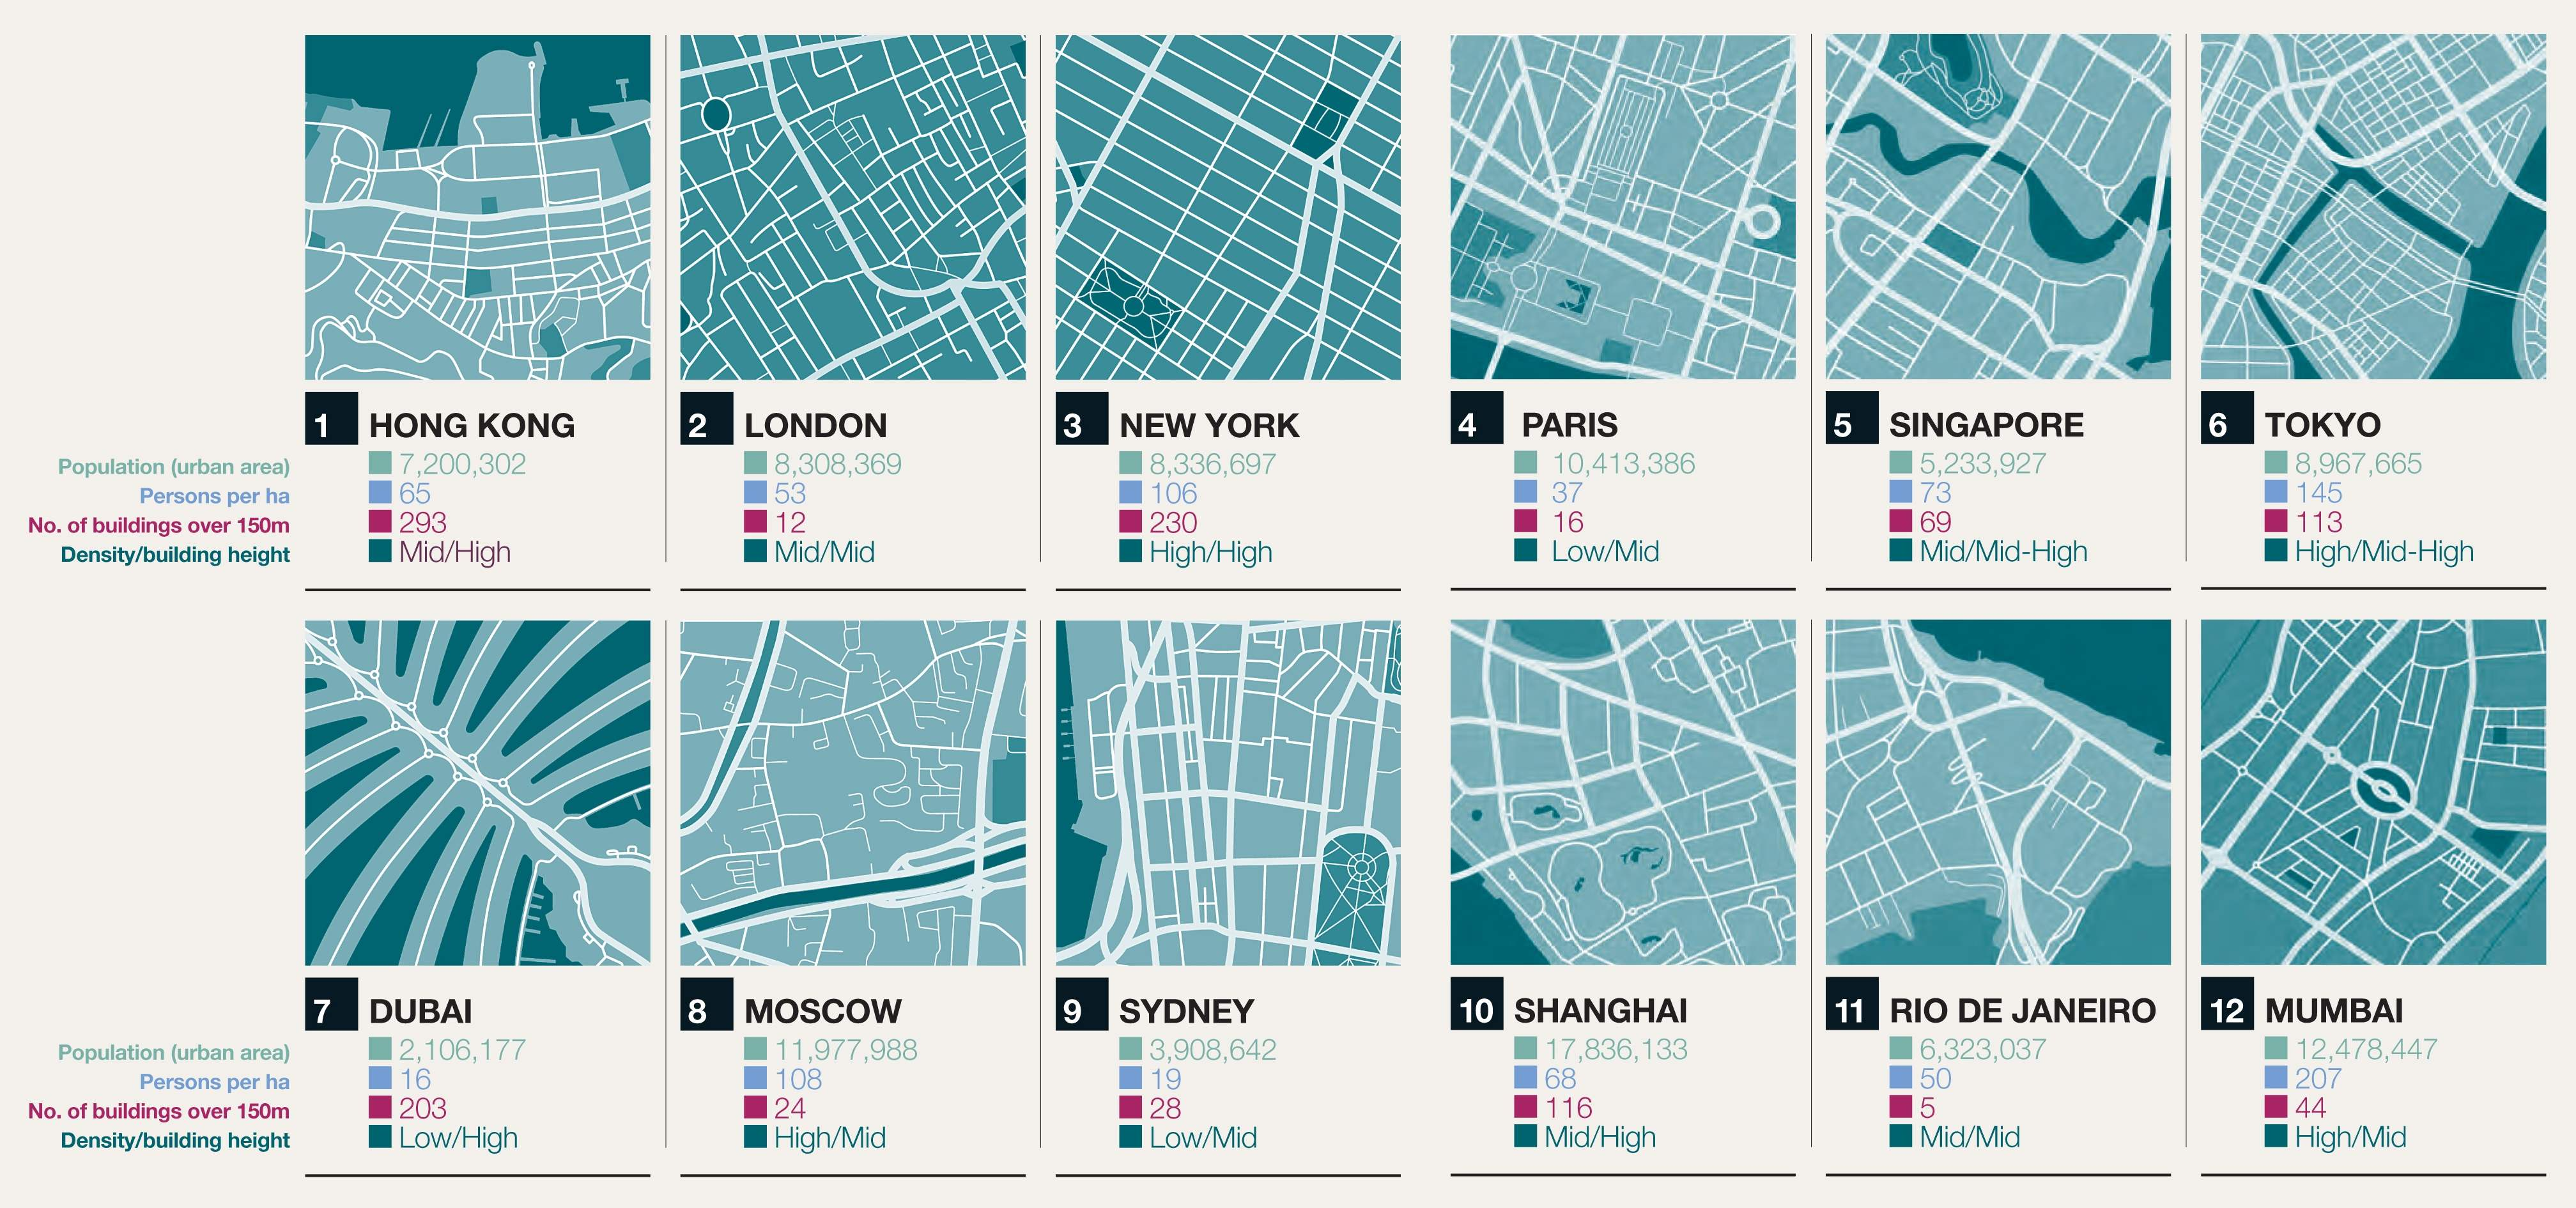 City statistics